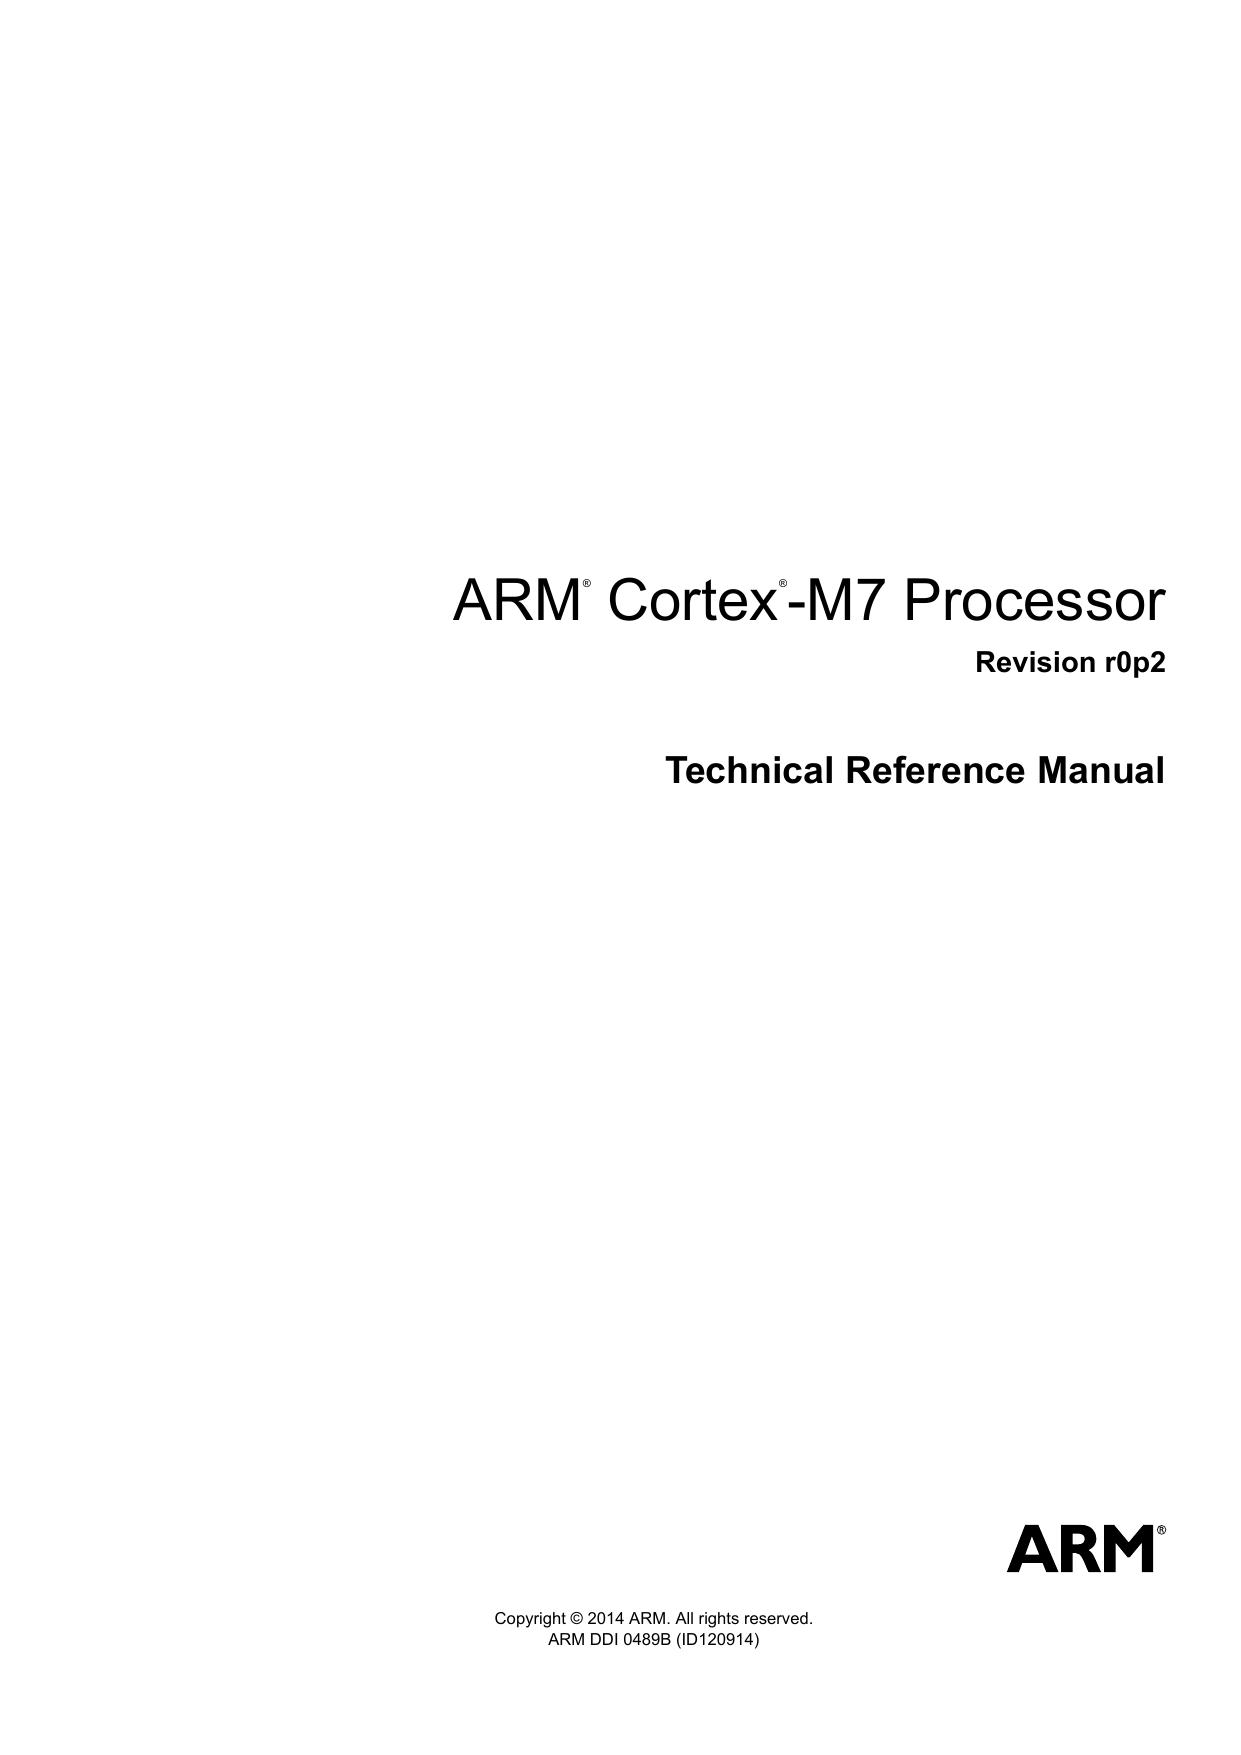 arm cortex m7 processor technical reference manual